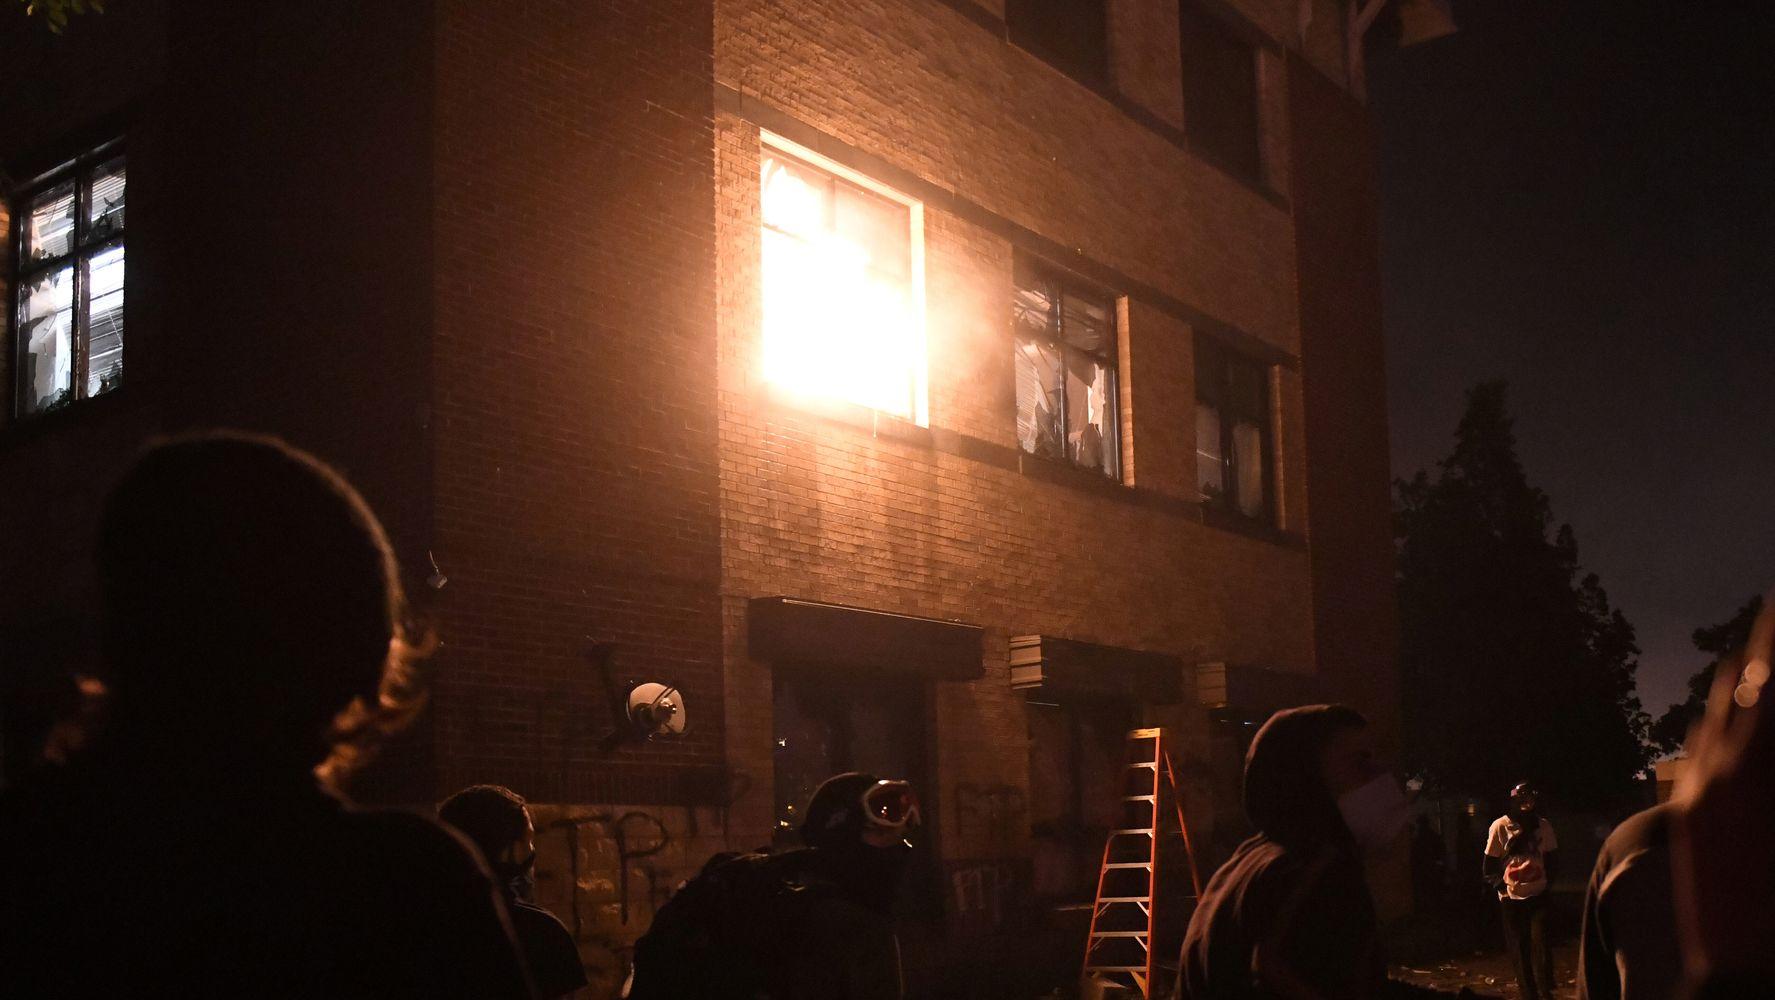 FBI: Far-Right Extremist Posed As BLM Protester, Shot Minneapolis Police Precinct